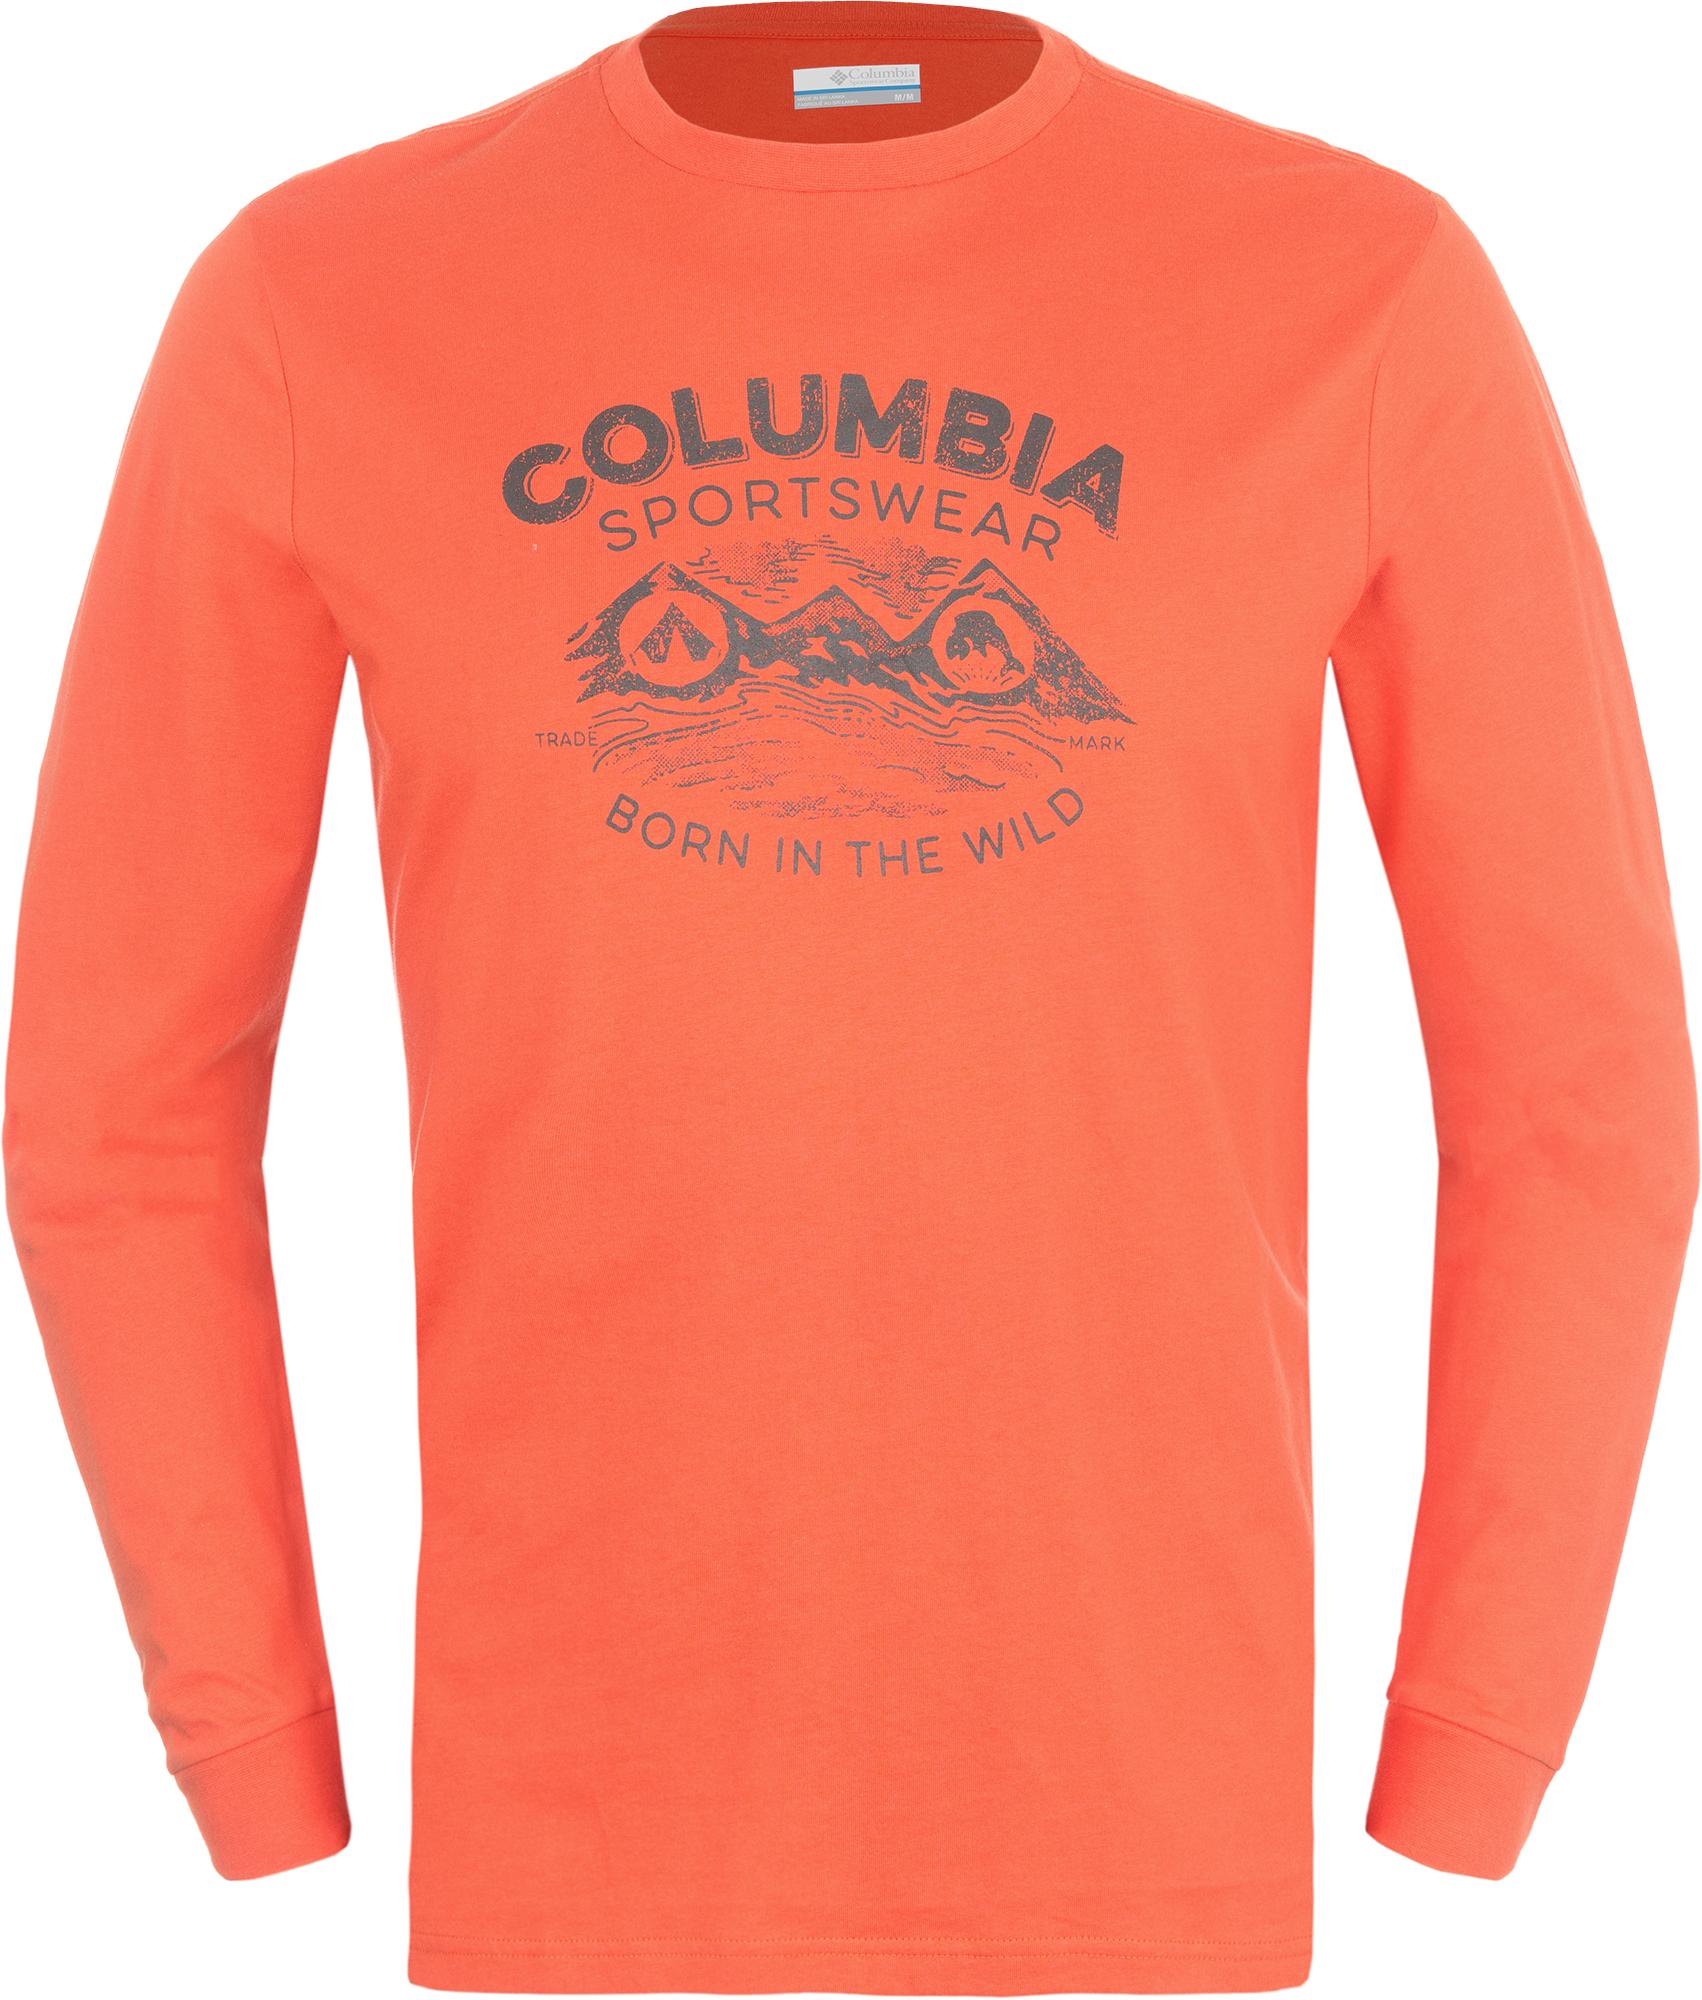 Columbia Футболка с длинным рукавом мужская Columbia Born In The Wild columbia рубашка с длинным рукавом мужская columbia boulder ridge